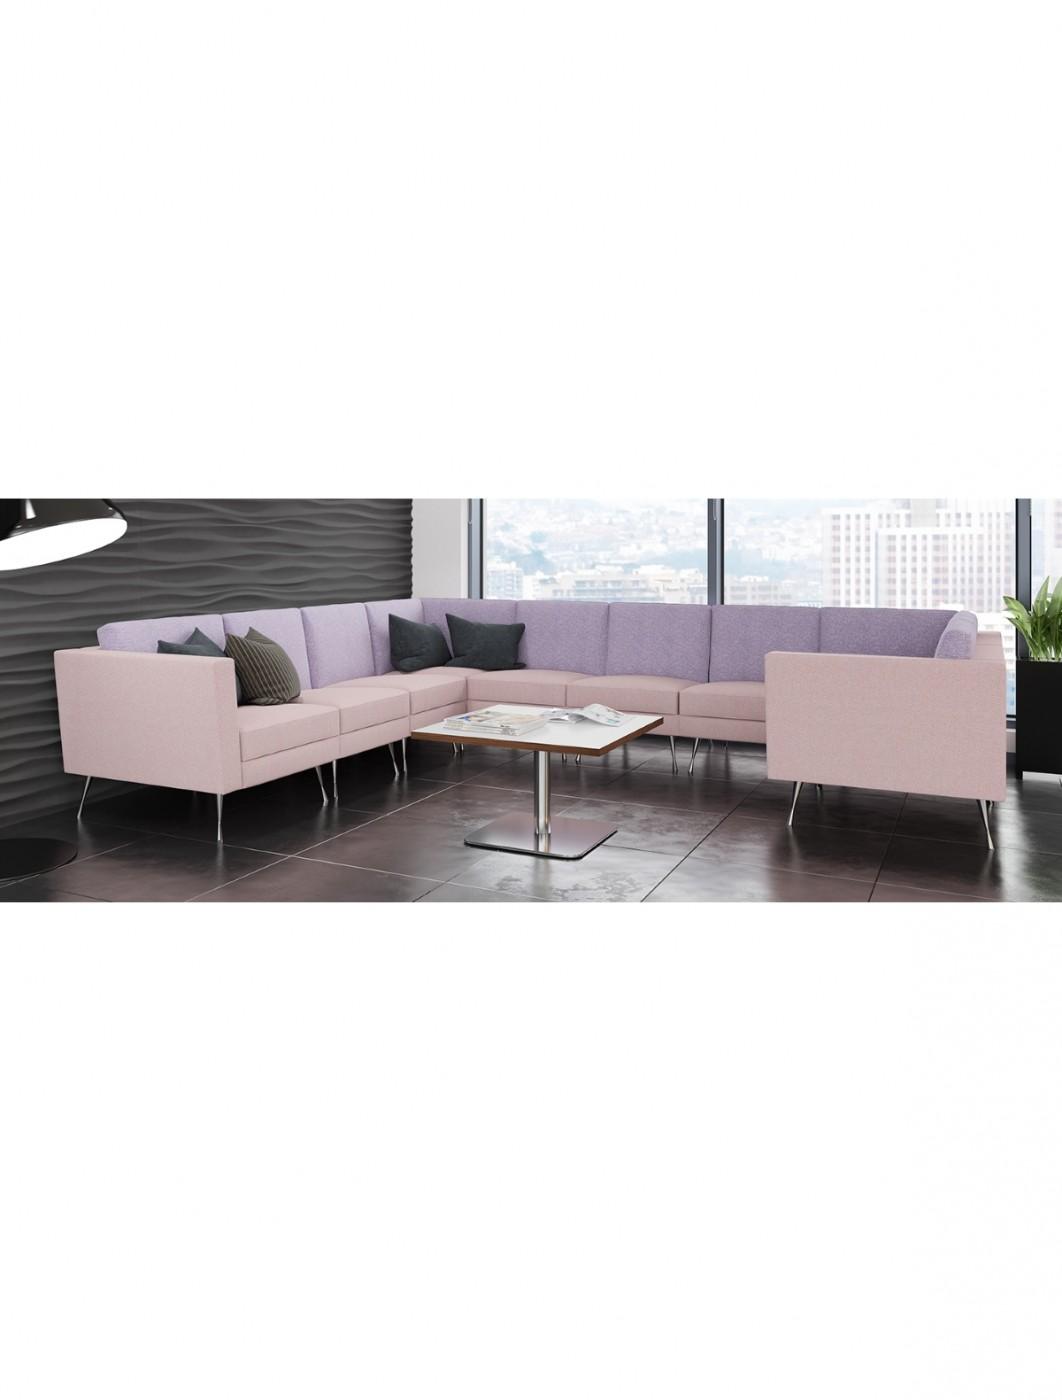 Dams Lyric Modular Reception Large Corner Sofa Set LYRSET   121 ...